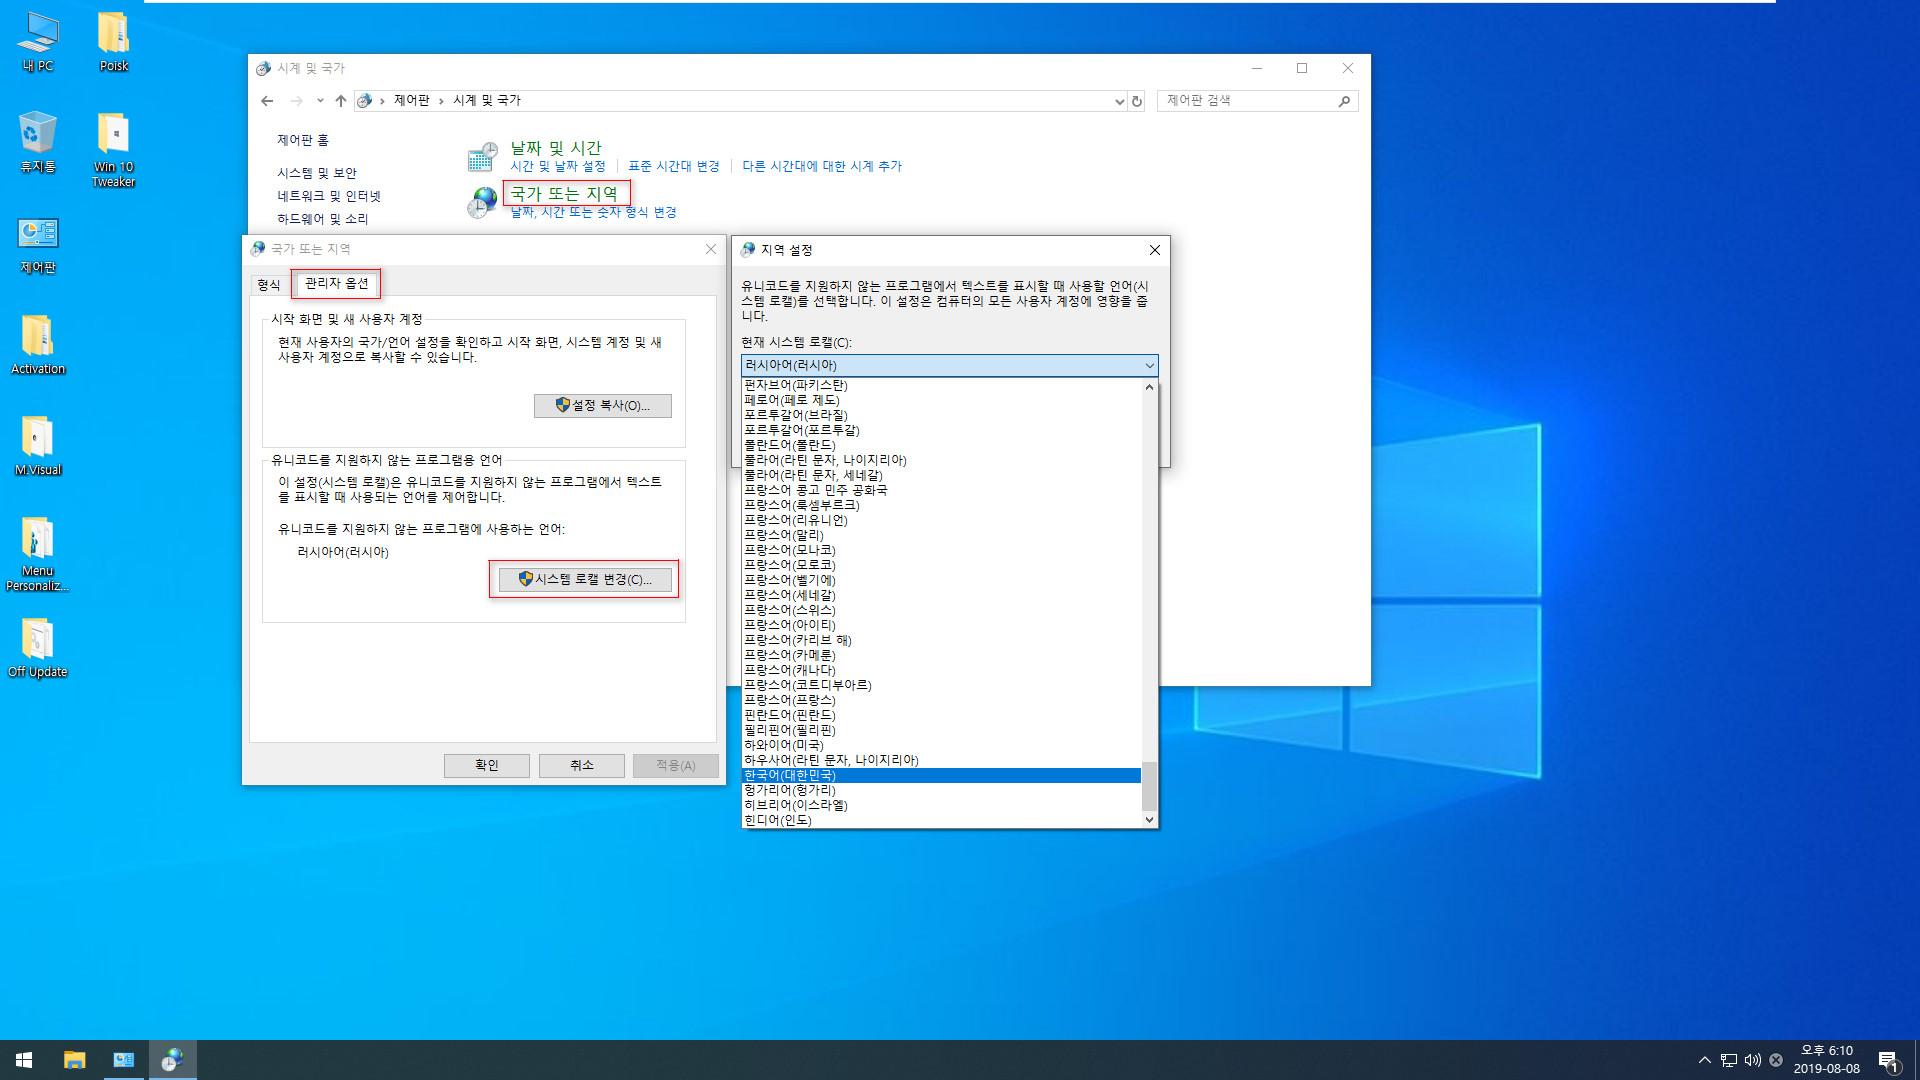 Windows 10 Enterprise x64 lite 1903 build 18362.267 by Zosma.iso - 러시아어 한글화 시도 - 그래서 그냥 원본대로 설치 후에 한글화 시도 2019-08-09_001017.jpg